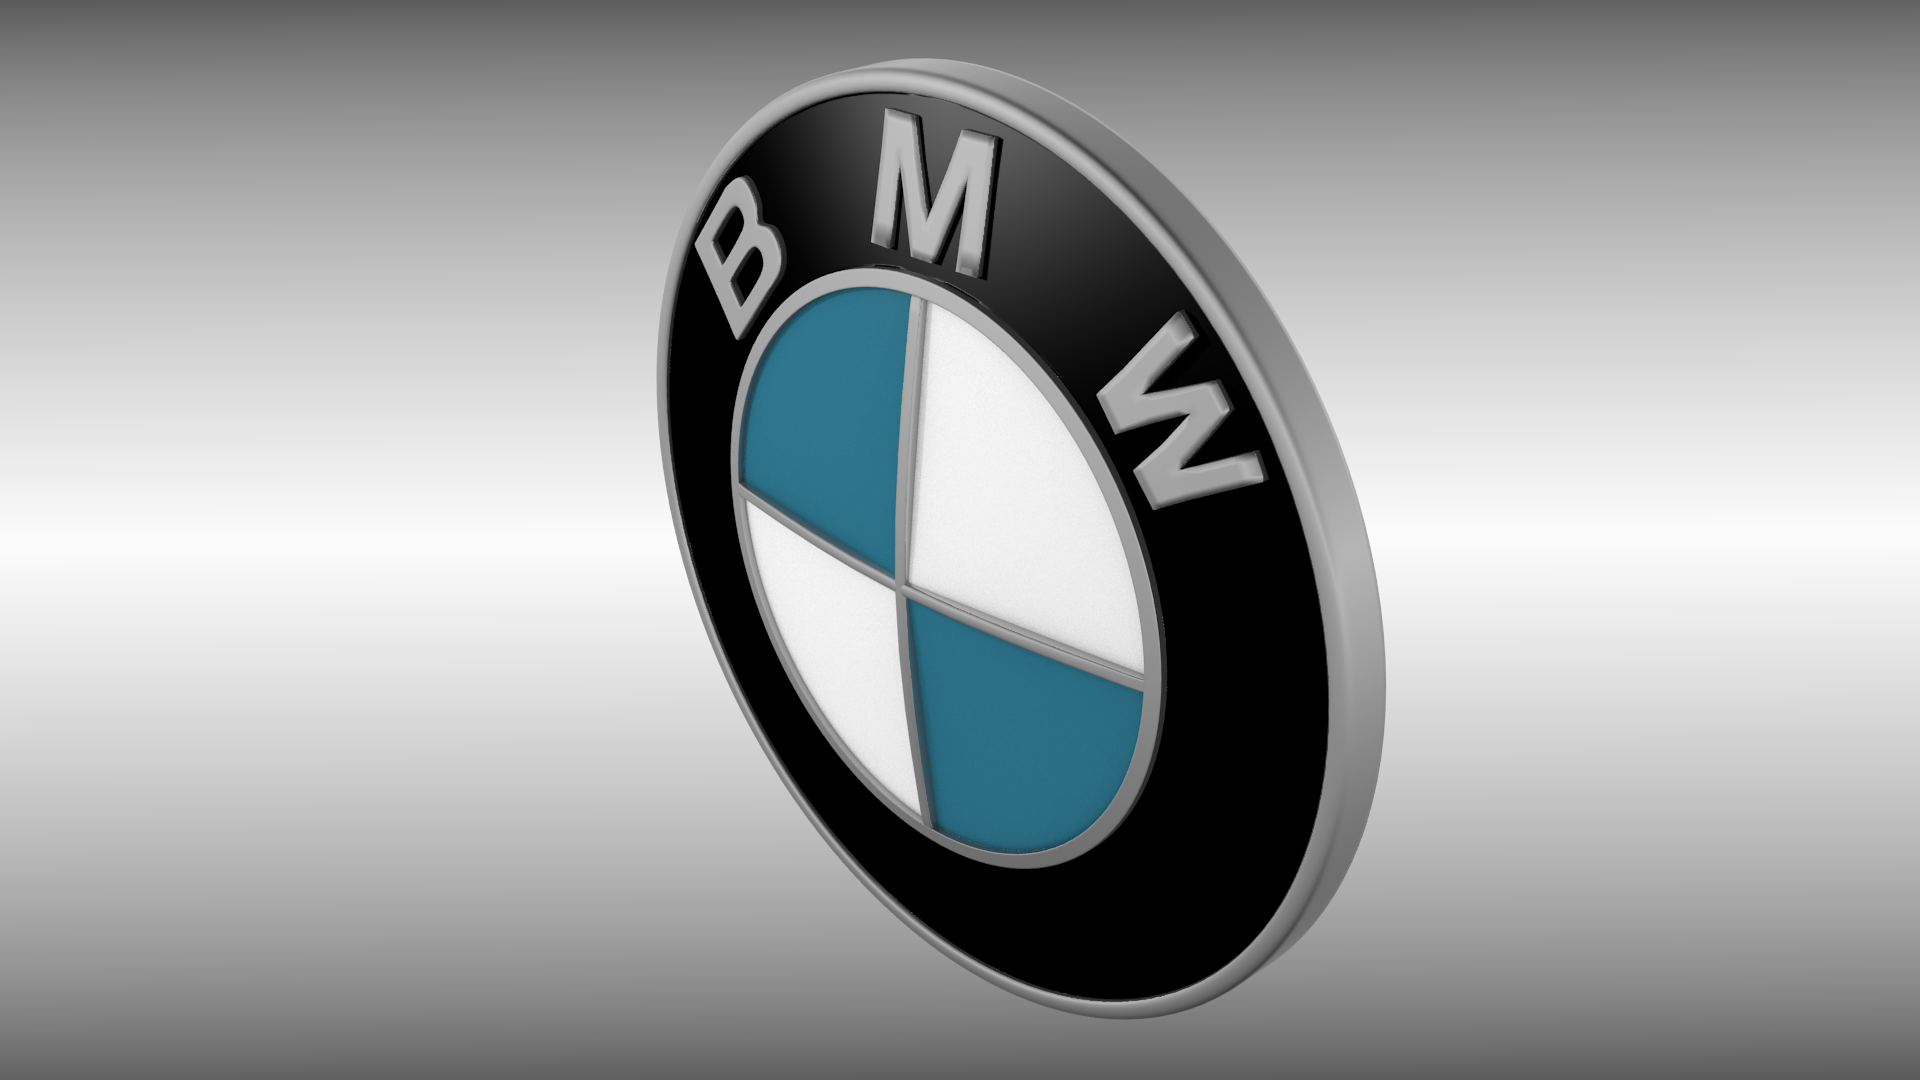 S Logo 3d Wallpaper BMW – Logos Download